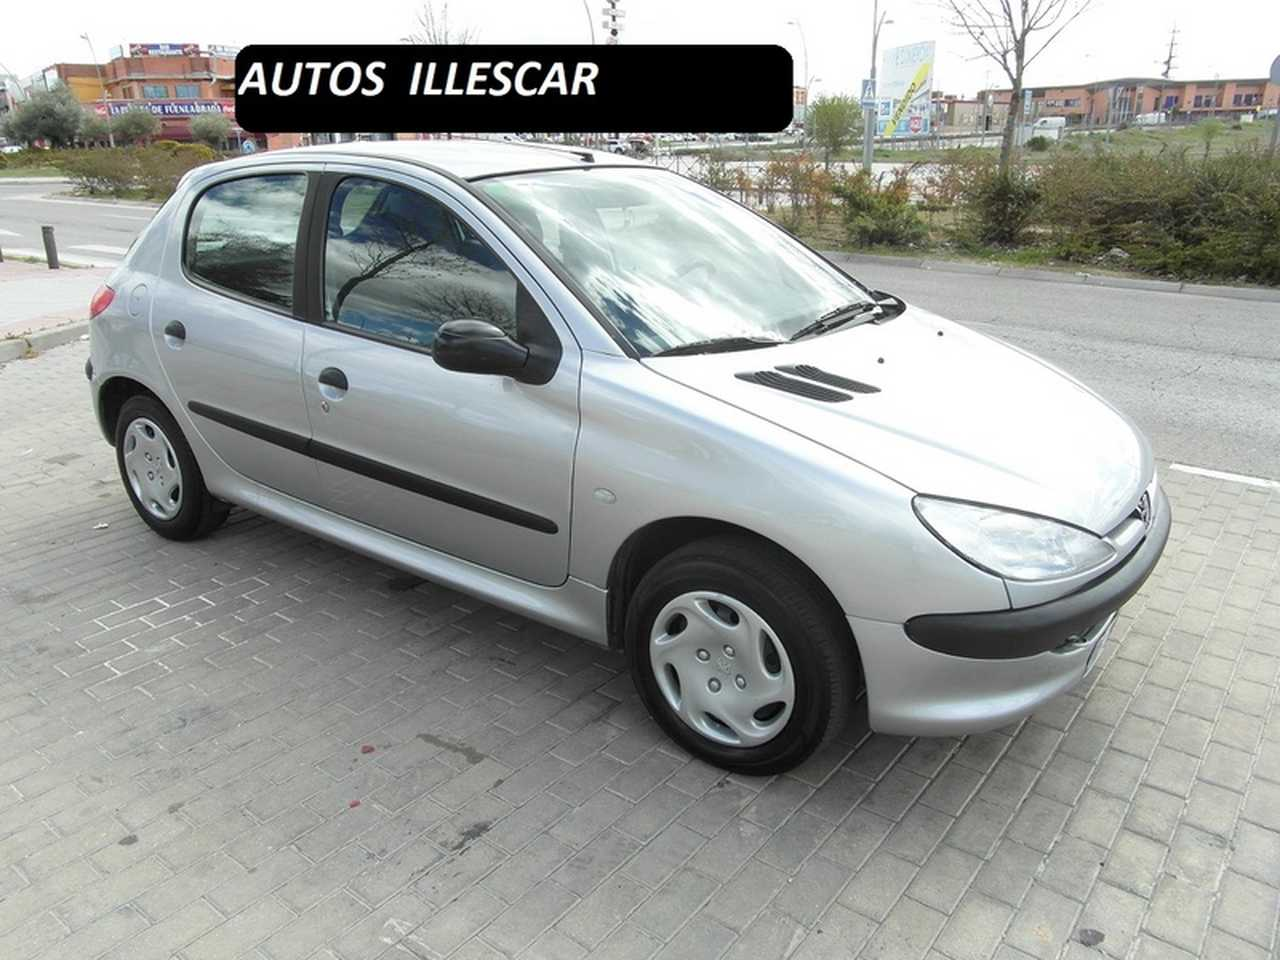 Peugeot 206 1.9 D XRD 70 CV KILOMETROS CERTIFICADOS  111.635 KM  - Foto 1